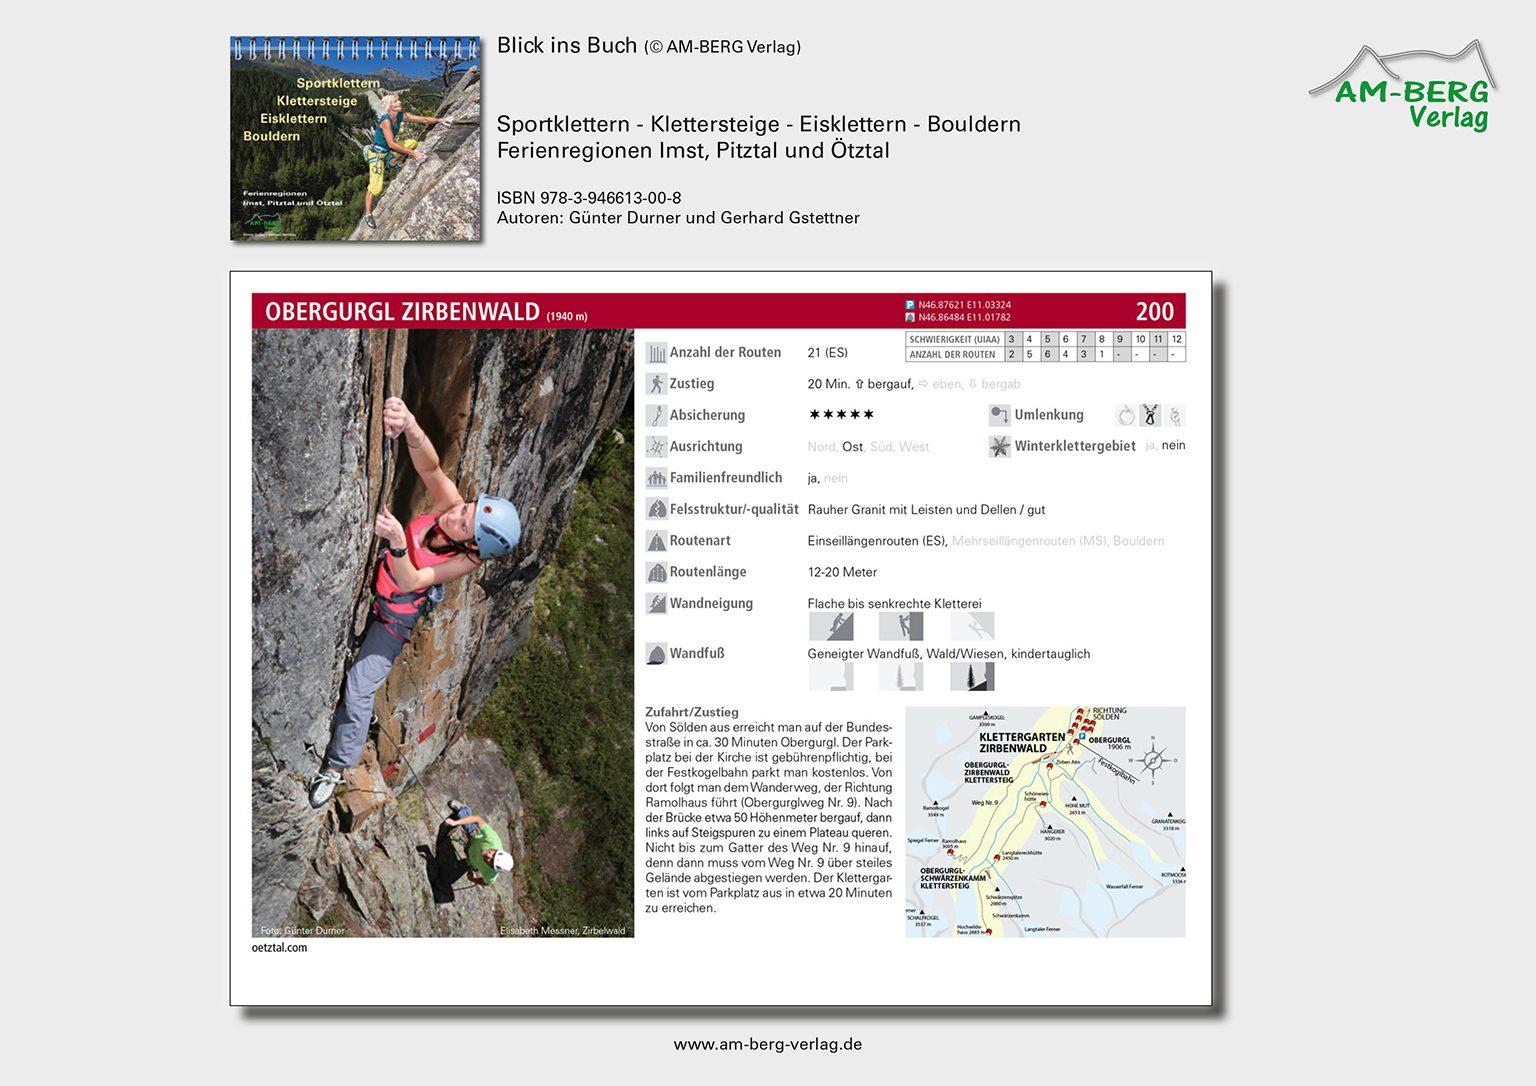 Sportklettern Imst-Pitztal-Ötztal_BlickinsBuch07_Obergurl-Zirbenwald